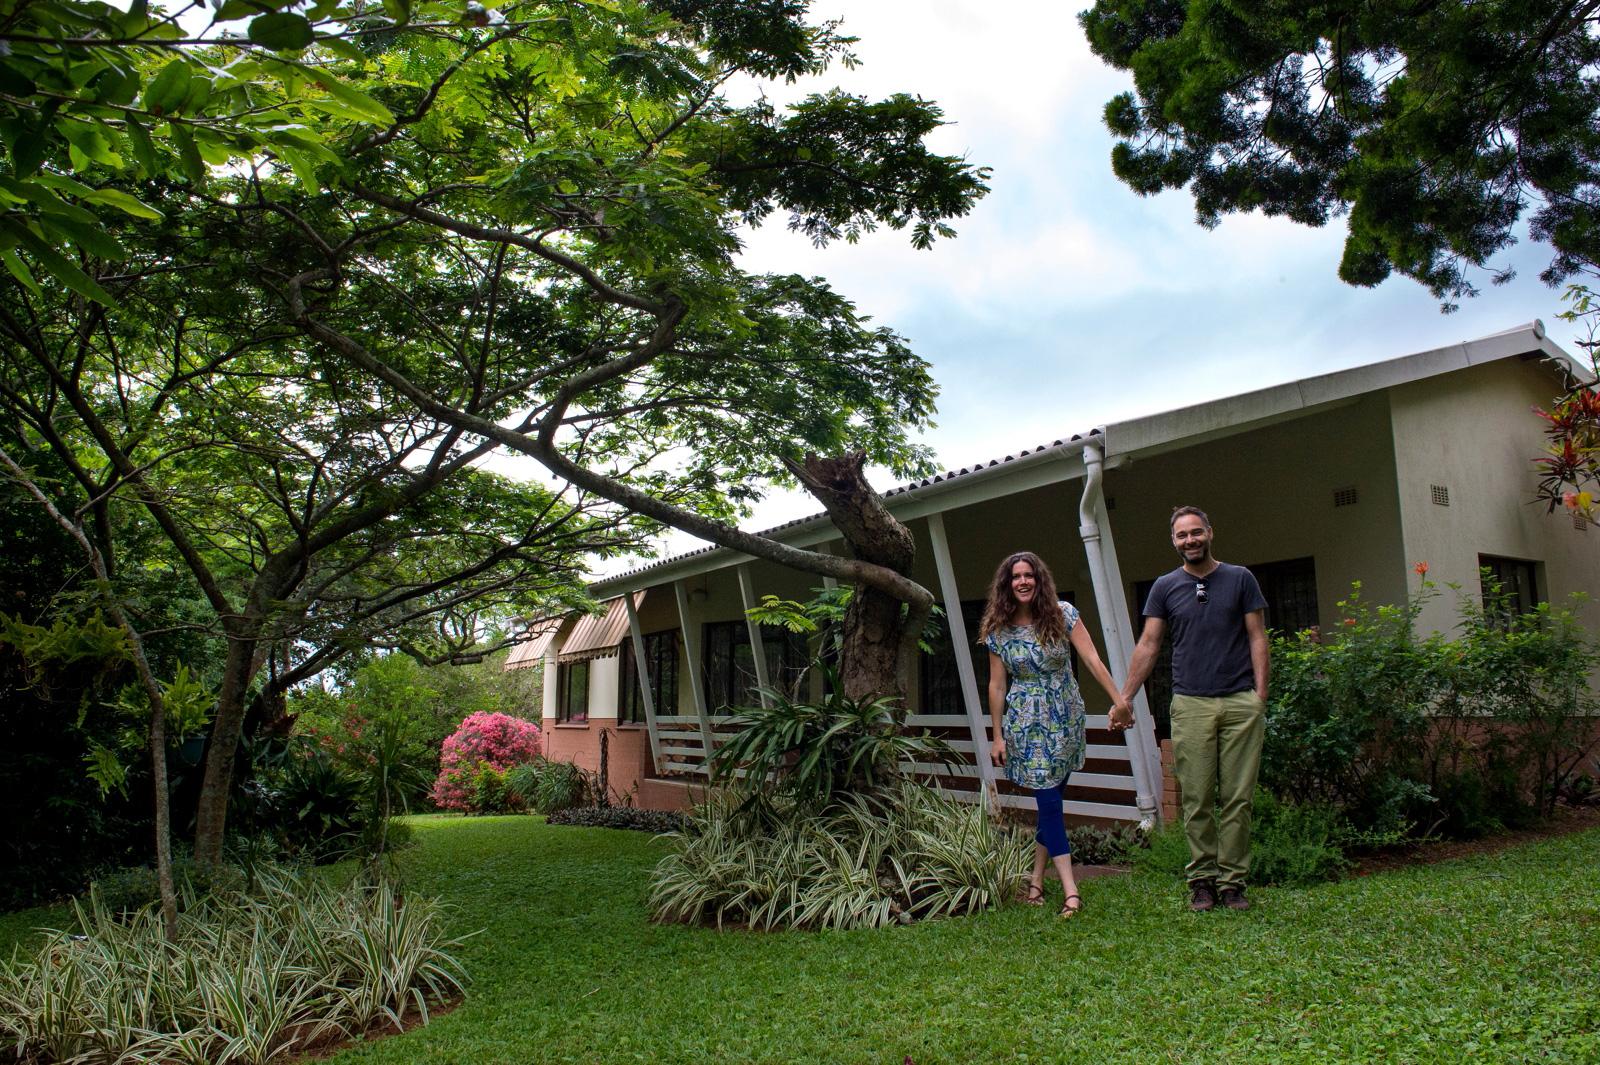 south-african-house-renovation-jacki-bruniquel-pre-001